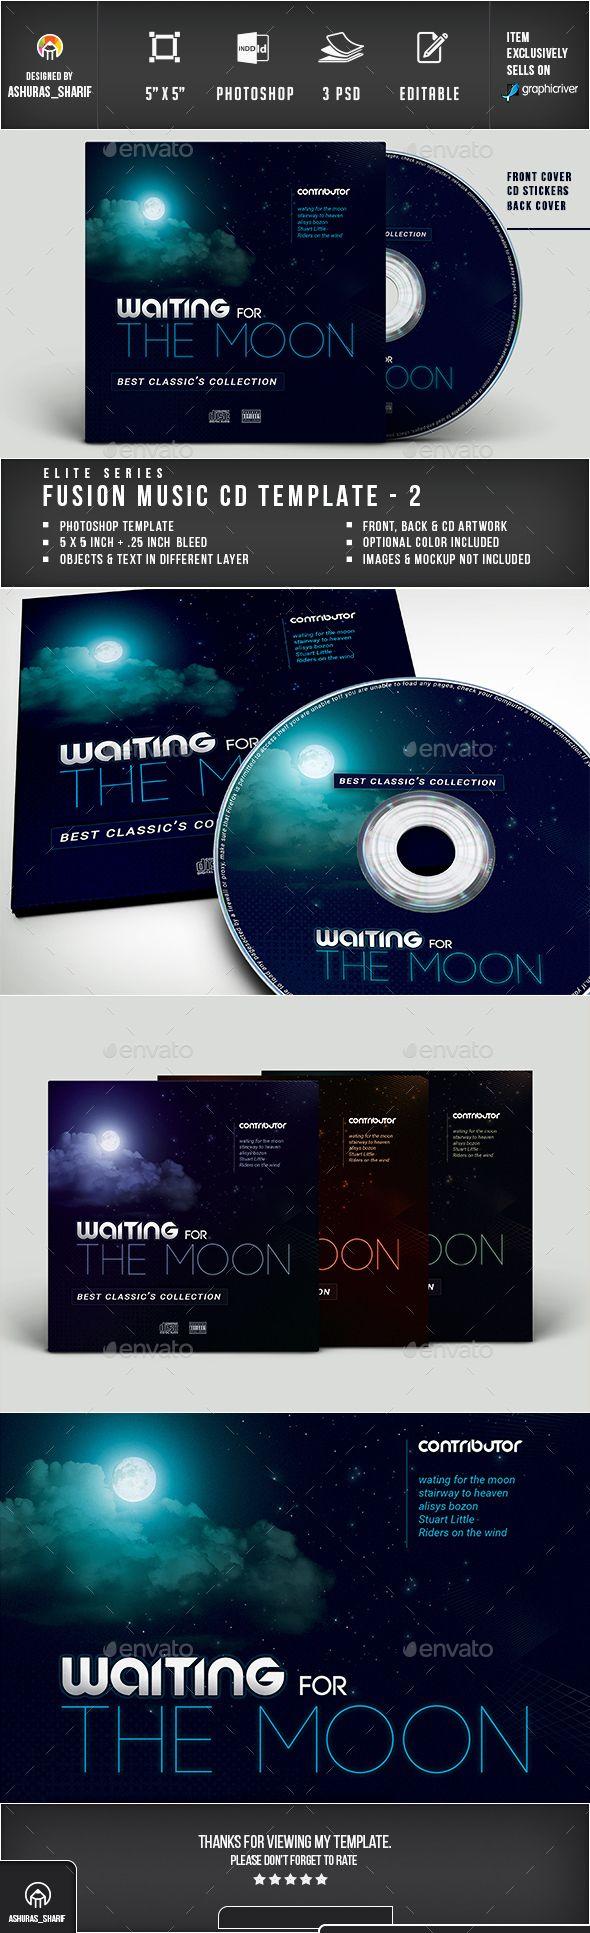 CD Cover   Cd cover, Cd cover template and Template